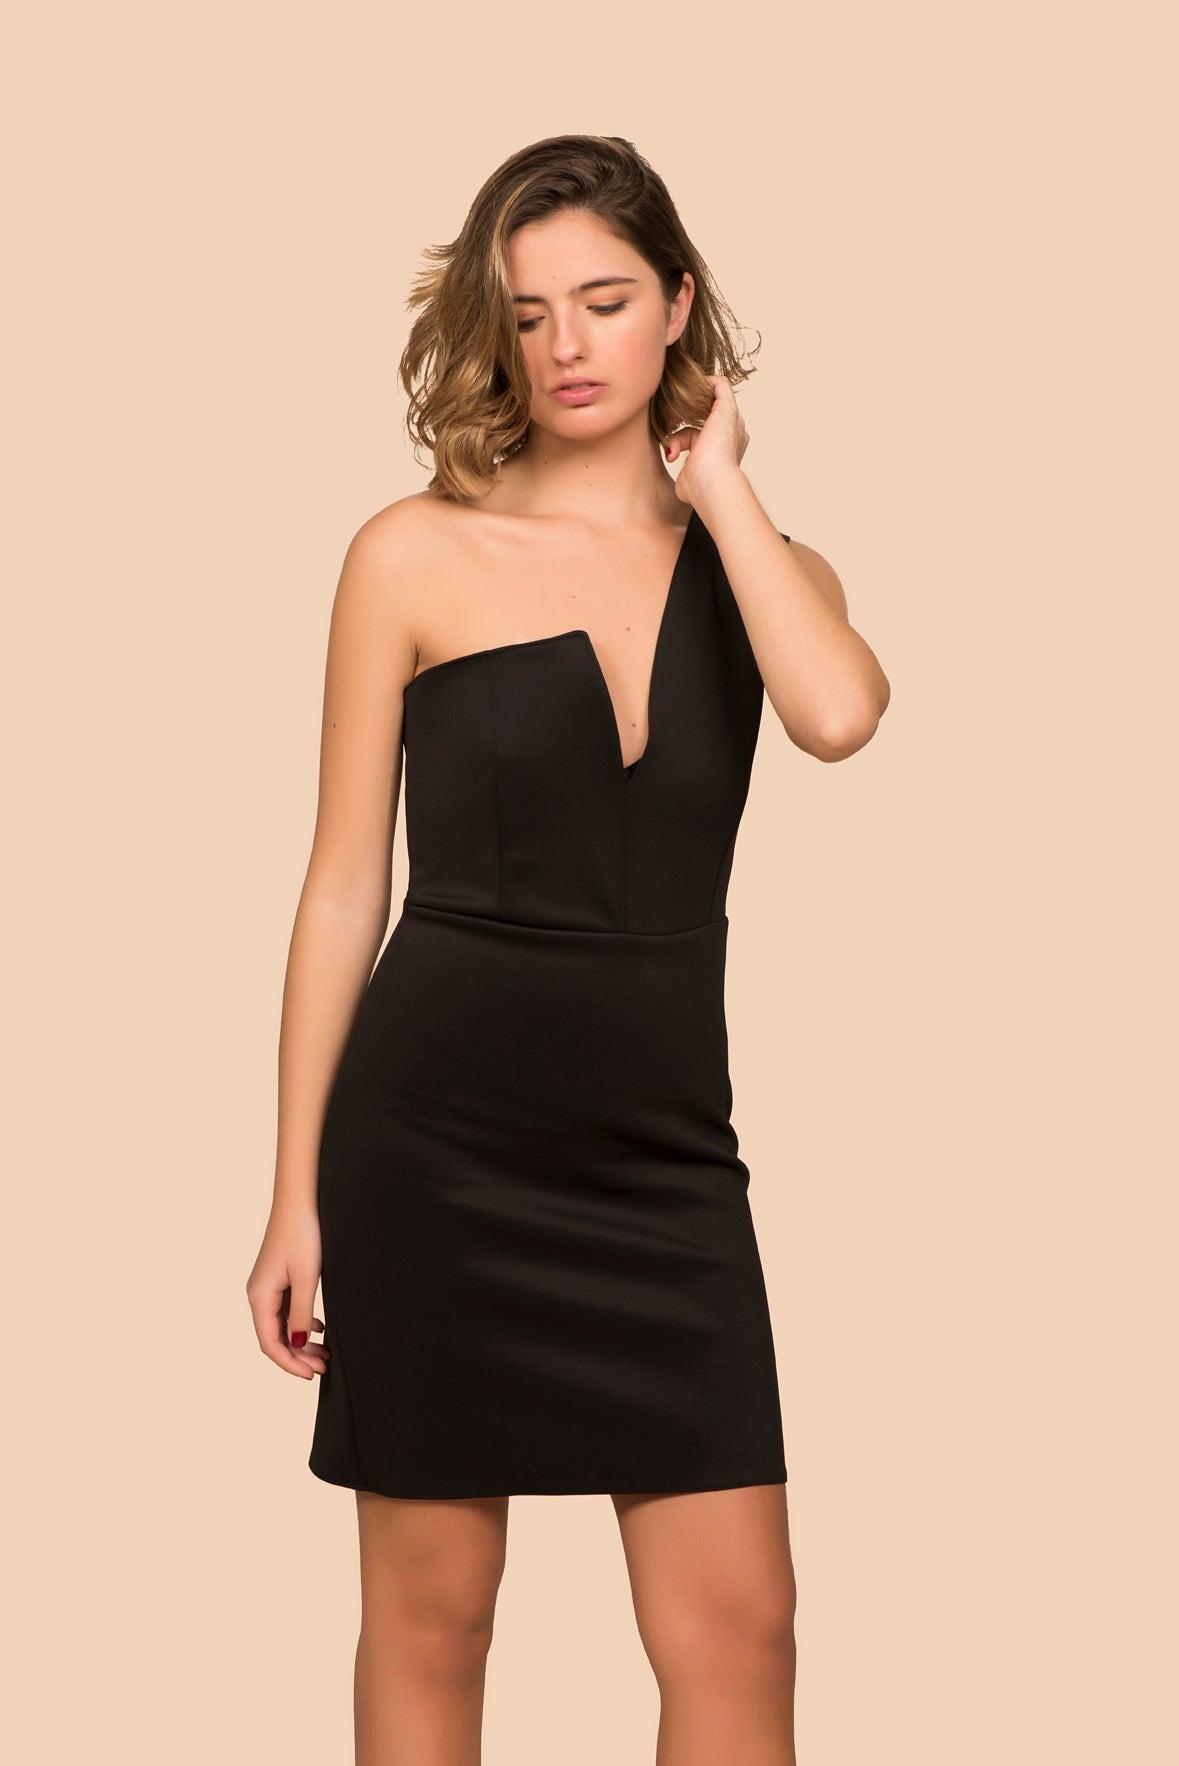 Image of Vestido Mia Negro